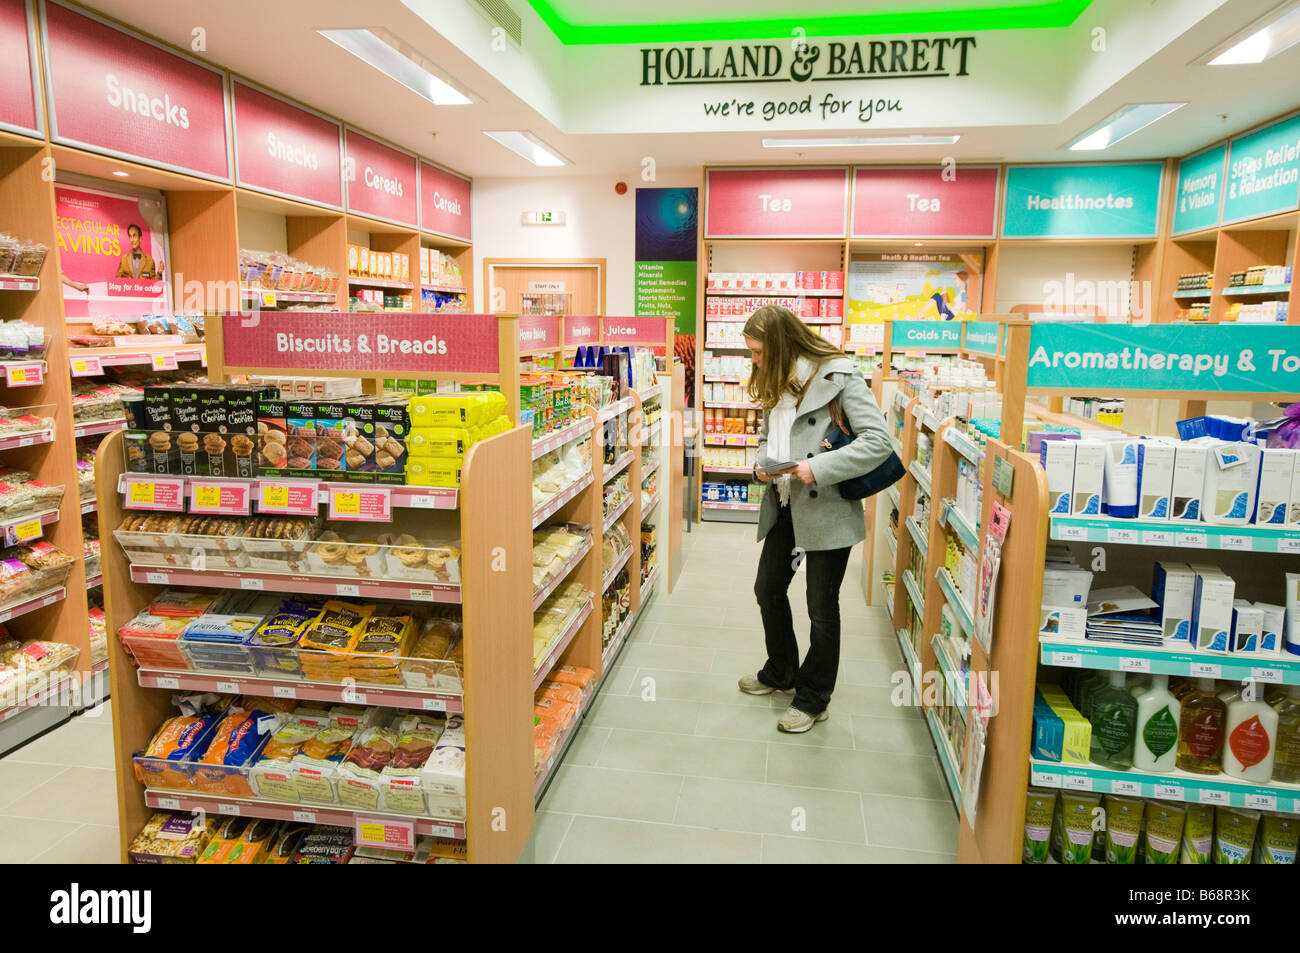 Holland and Barrett - Stock Image